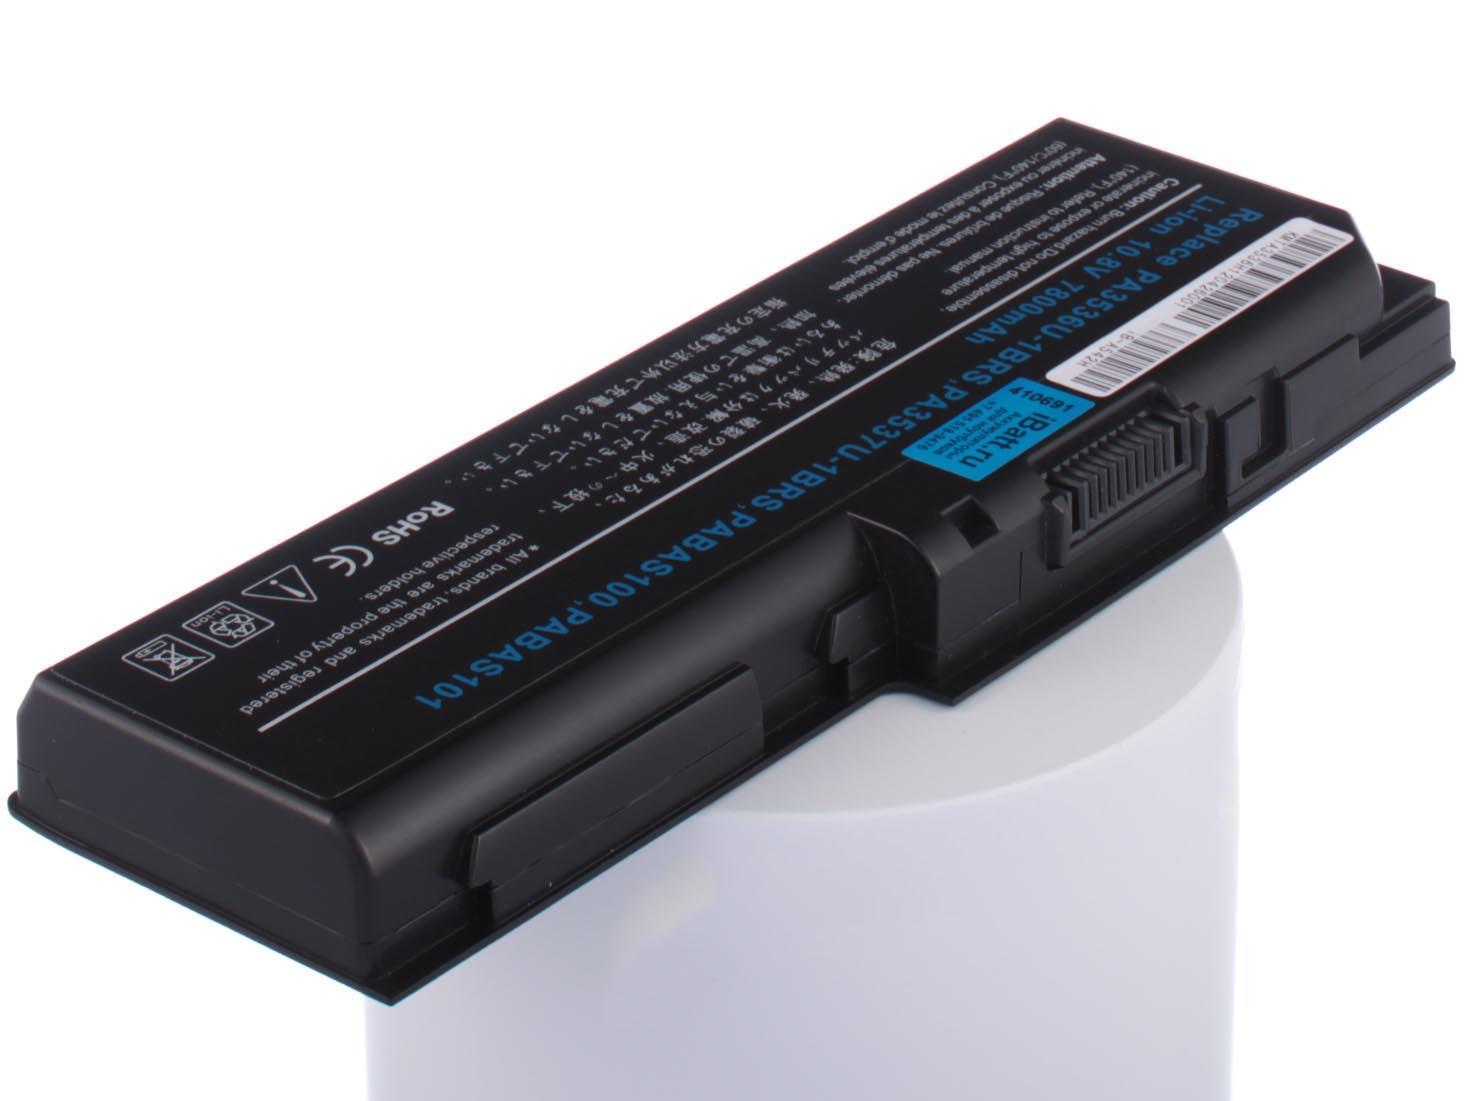 Аккумулятор для ноутбука iBatt для ToshiBa Satego X200-21U, Satellite P200-1JR, Satellite P300D-209, Satellite L350D-11S, Satellite L355D-S7815, Satellite X200-252, Satellite X205-SLi3, Satellite L350-263, Satellite P205 аккумулятор gerffins для samsung e1050 e1085 x200